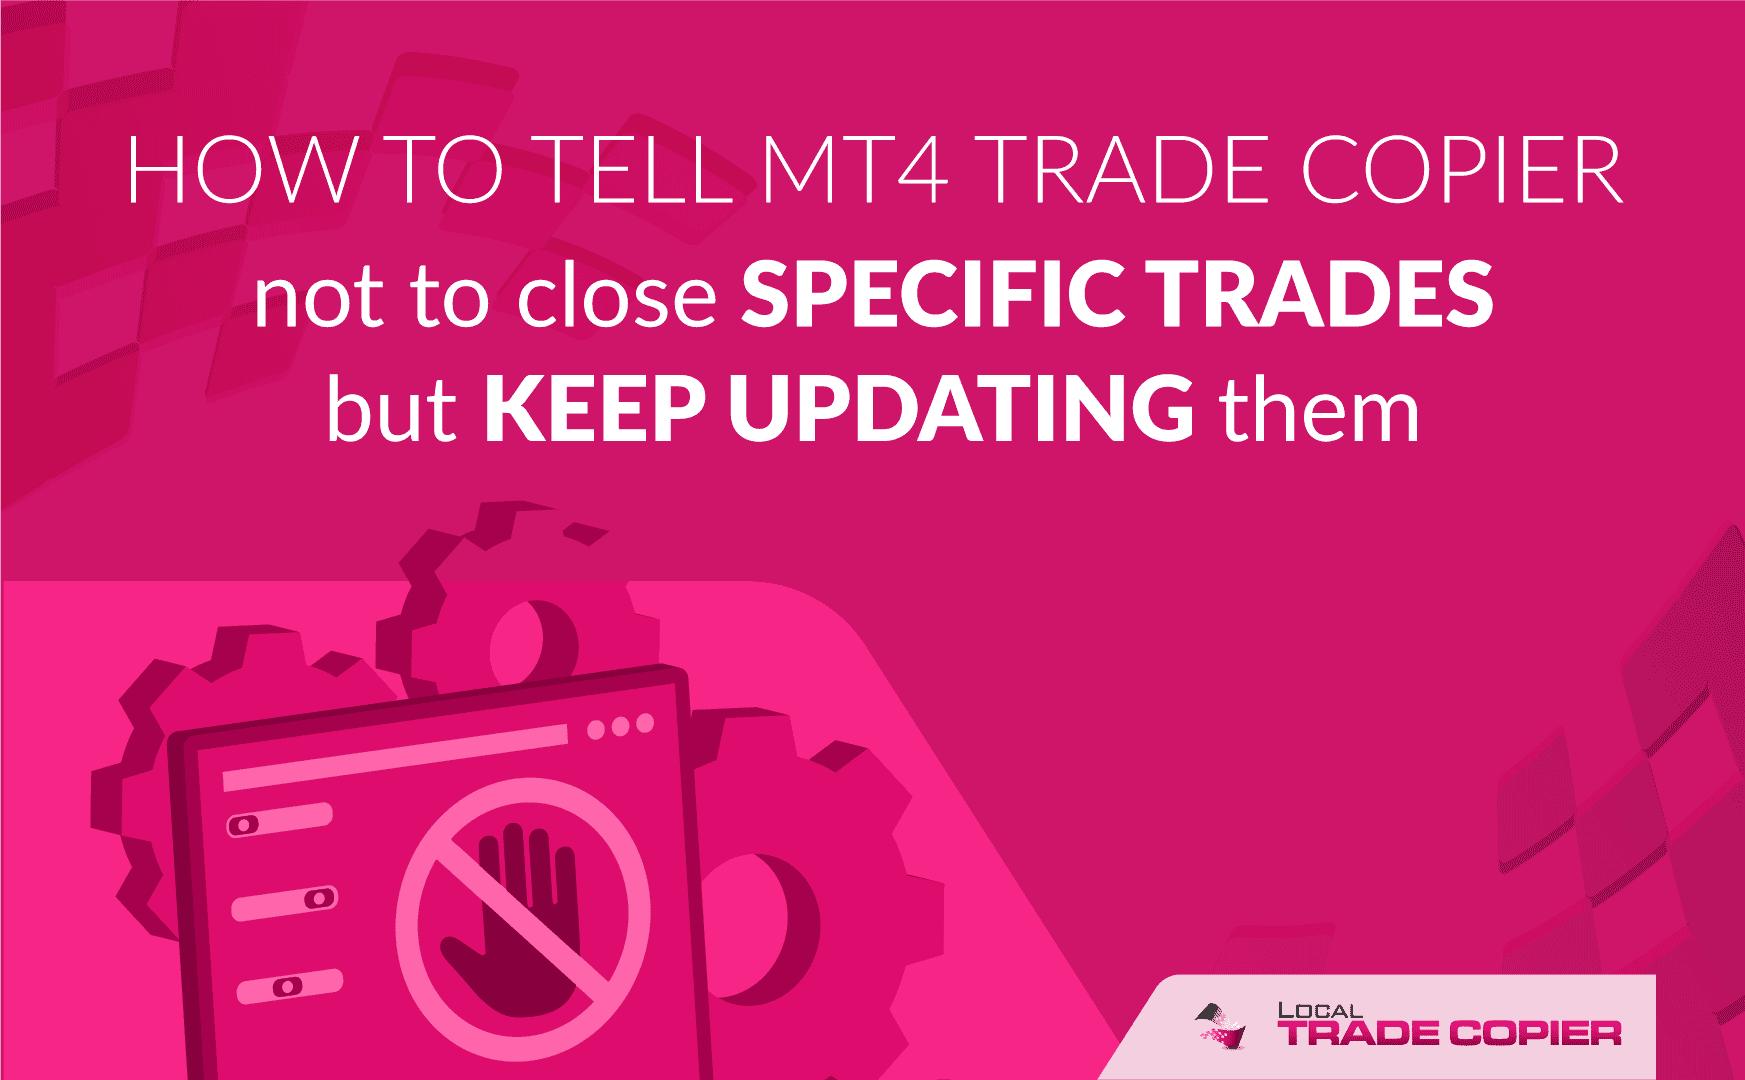 Local-Trade-Copier-Tutorials-do-not-close-certain-trades-1745x1080